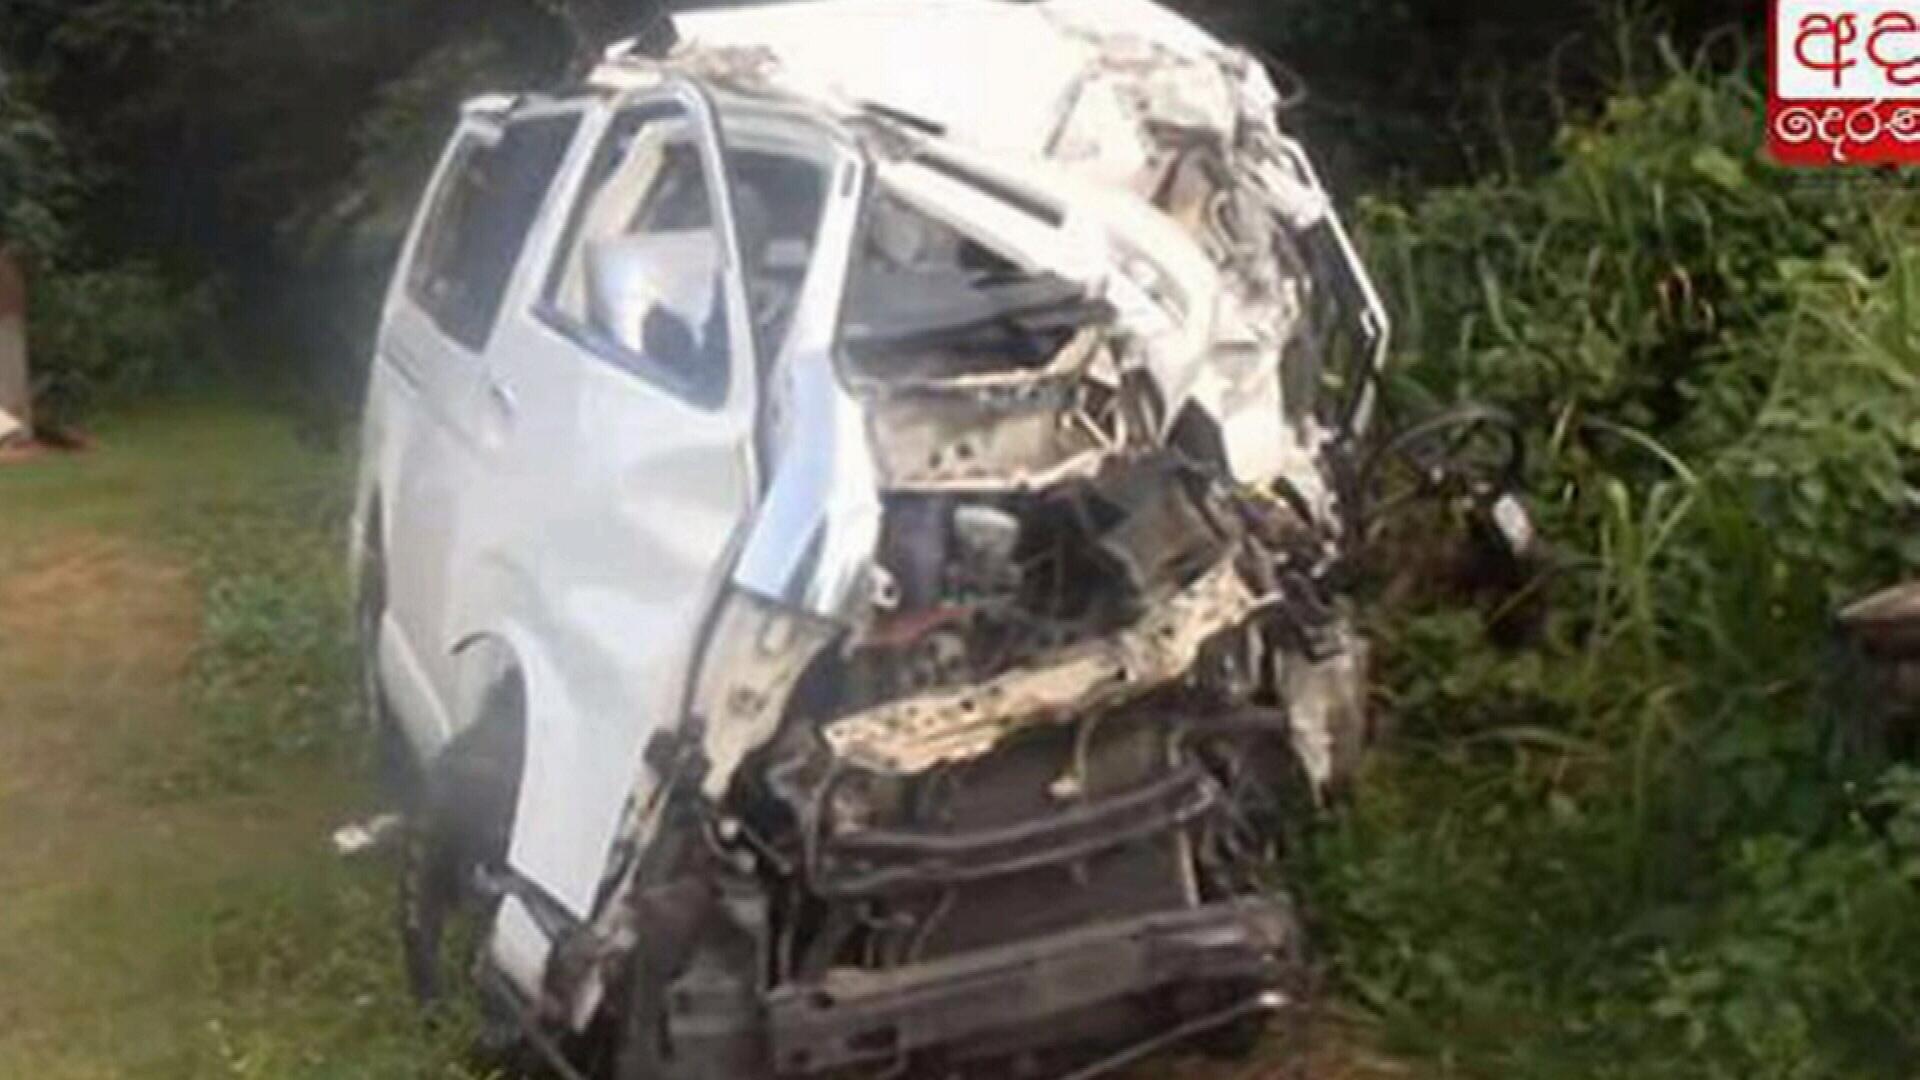 Australian woman and daughter killed in car crash in Sri Lanka